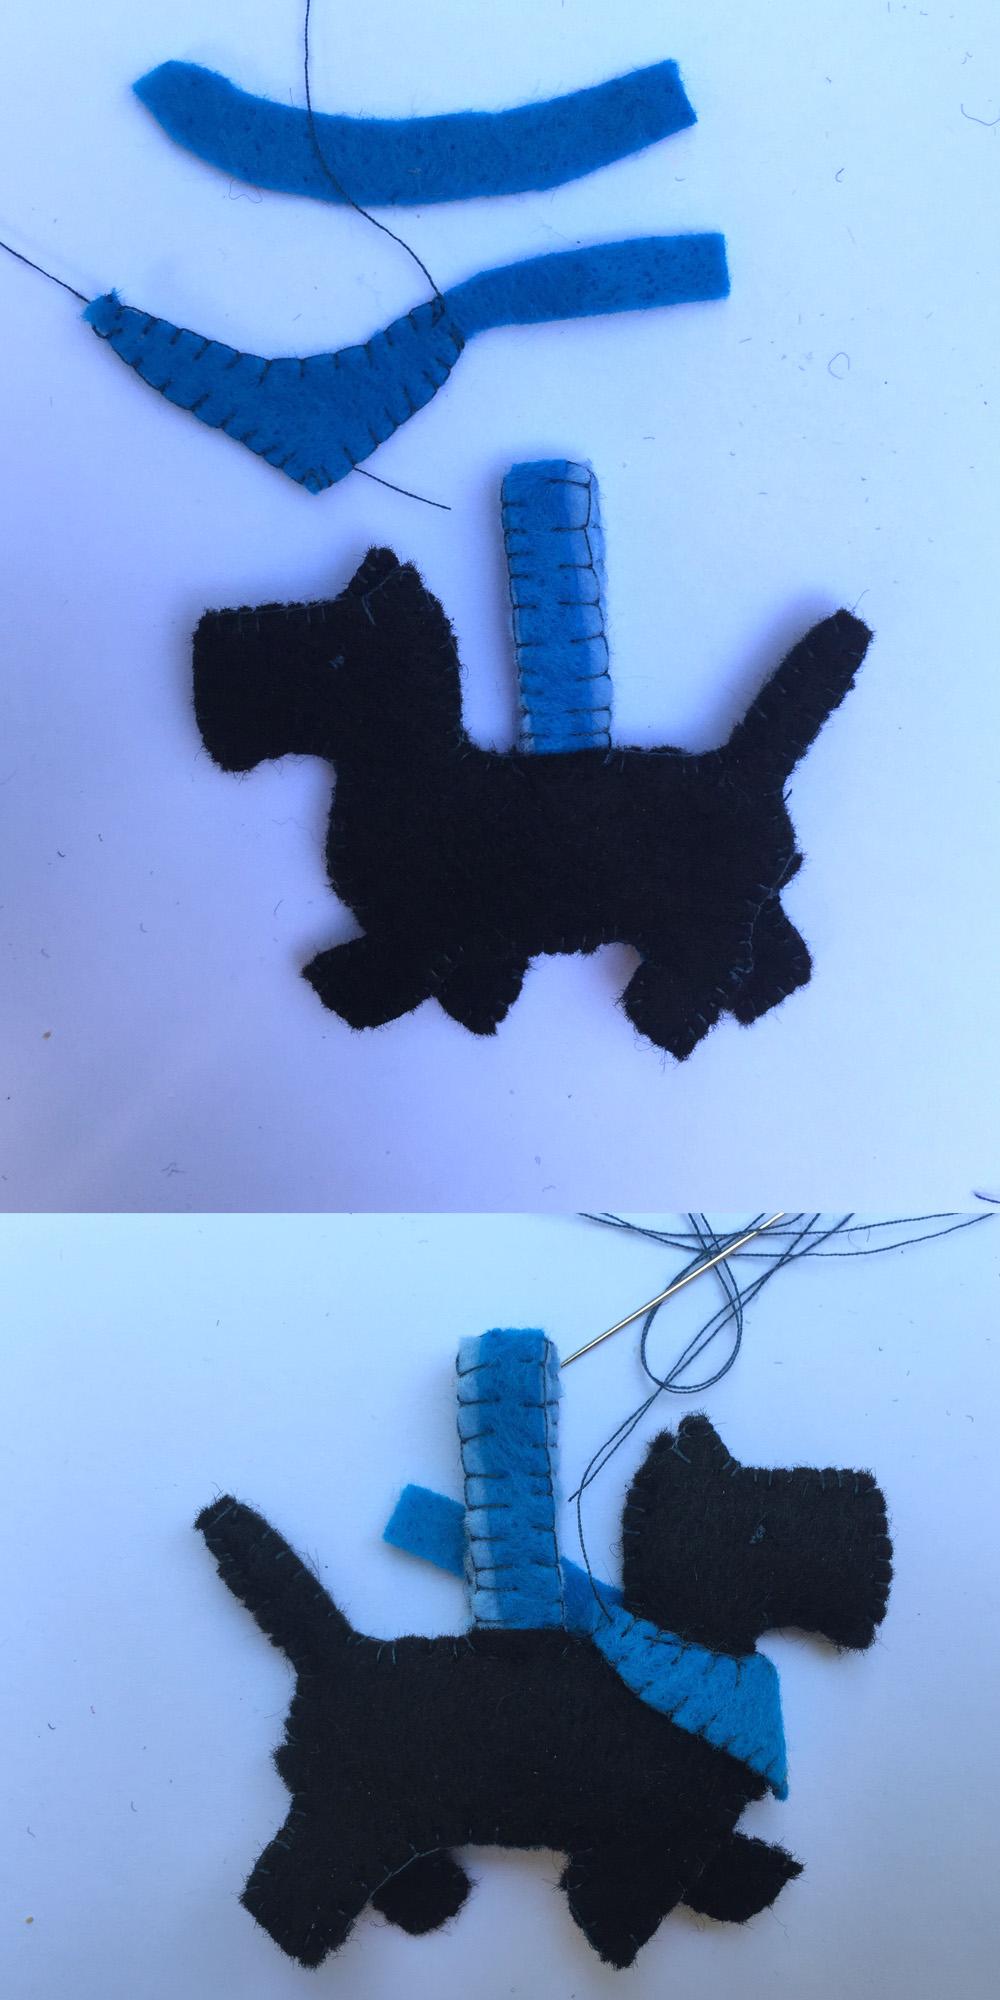 besonderes Filz Ornament nähen, Hund aus Filz nähen als Schlüsselanhänger,